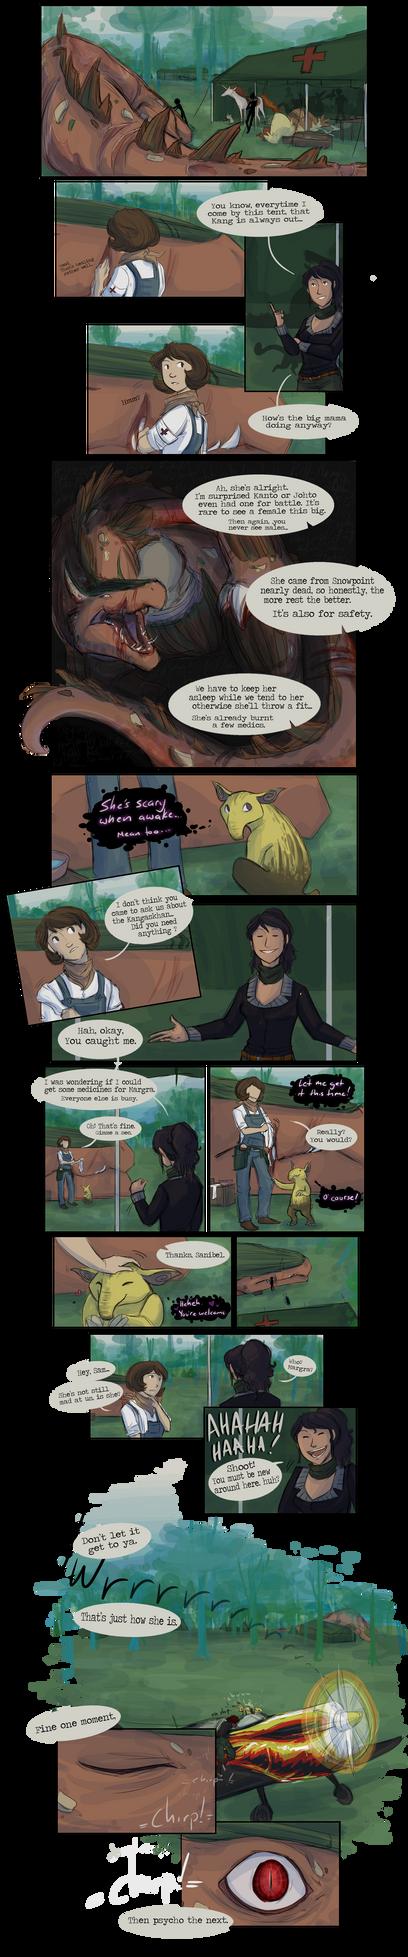 End Run Round 6: Page 4